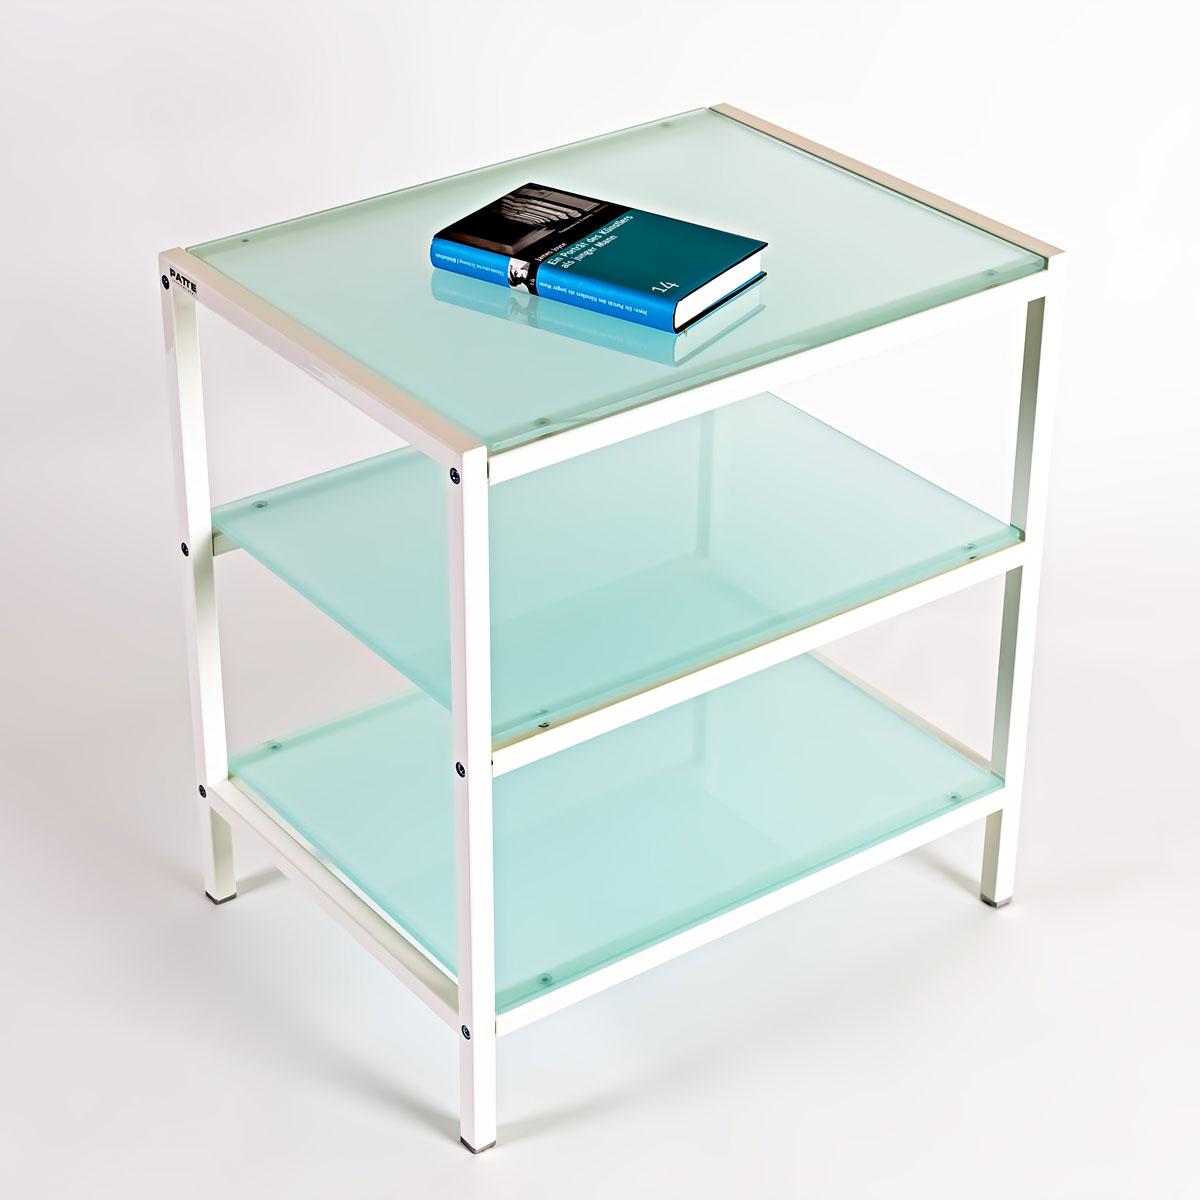 hifi m bel phonom bel hifi racks hifi regale audio m bel bei hifi tv seite 3. Black Bedroom Furniture Sets. Home Design Ideas